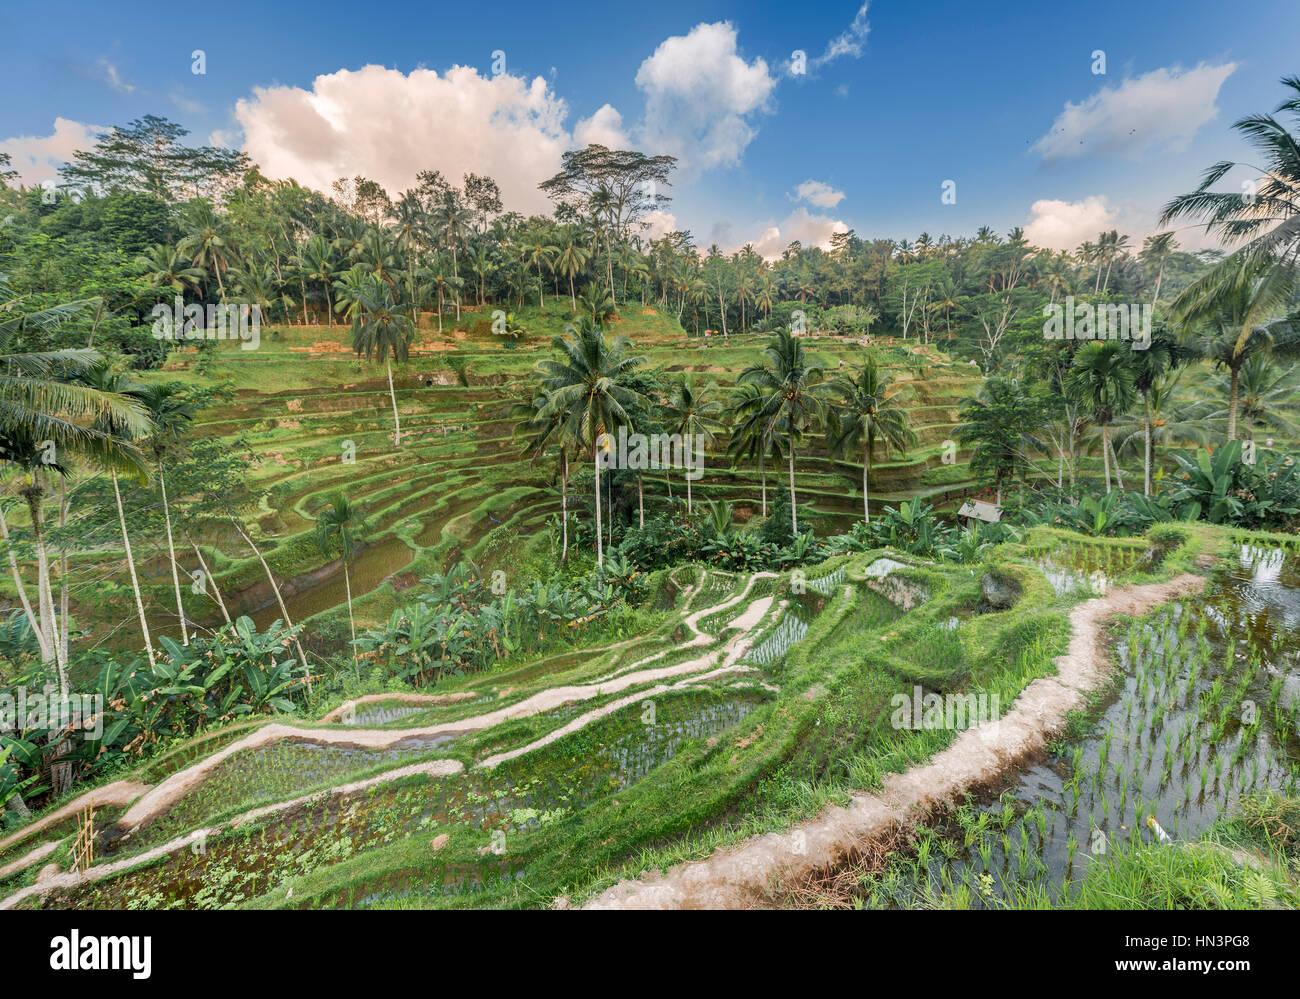 Jatiluwih rice terraces, Penebel, Bali, Indonesia - Stock Image